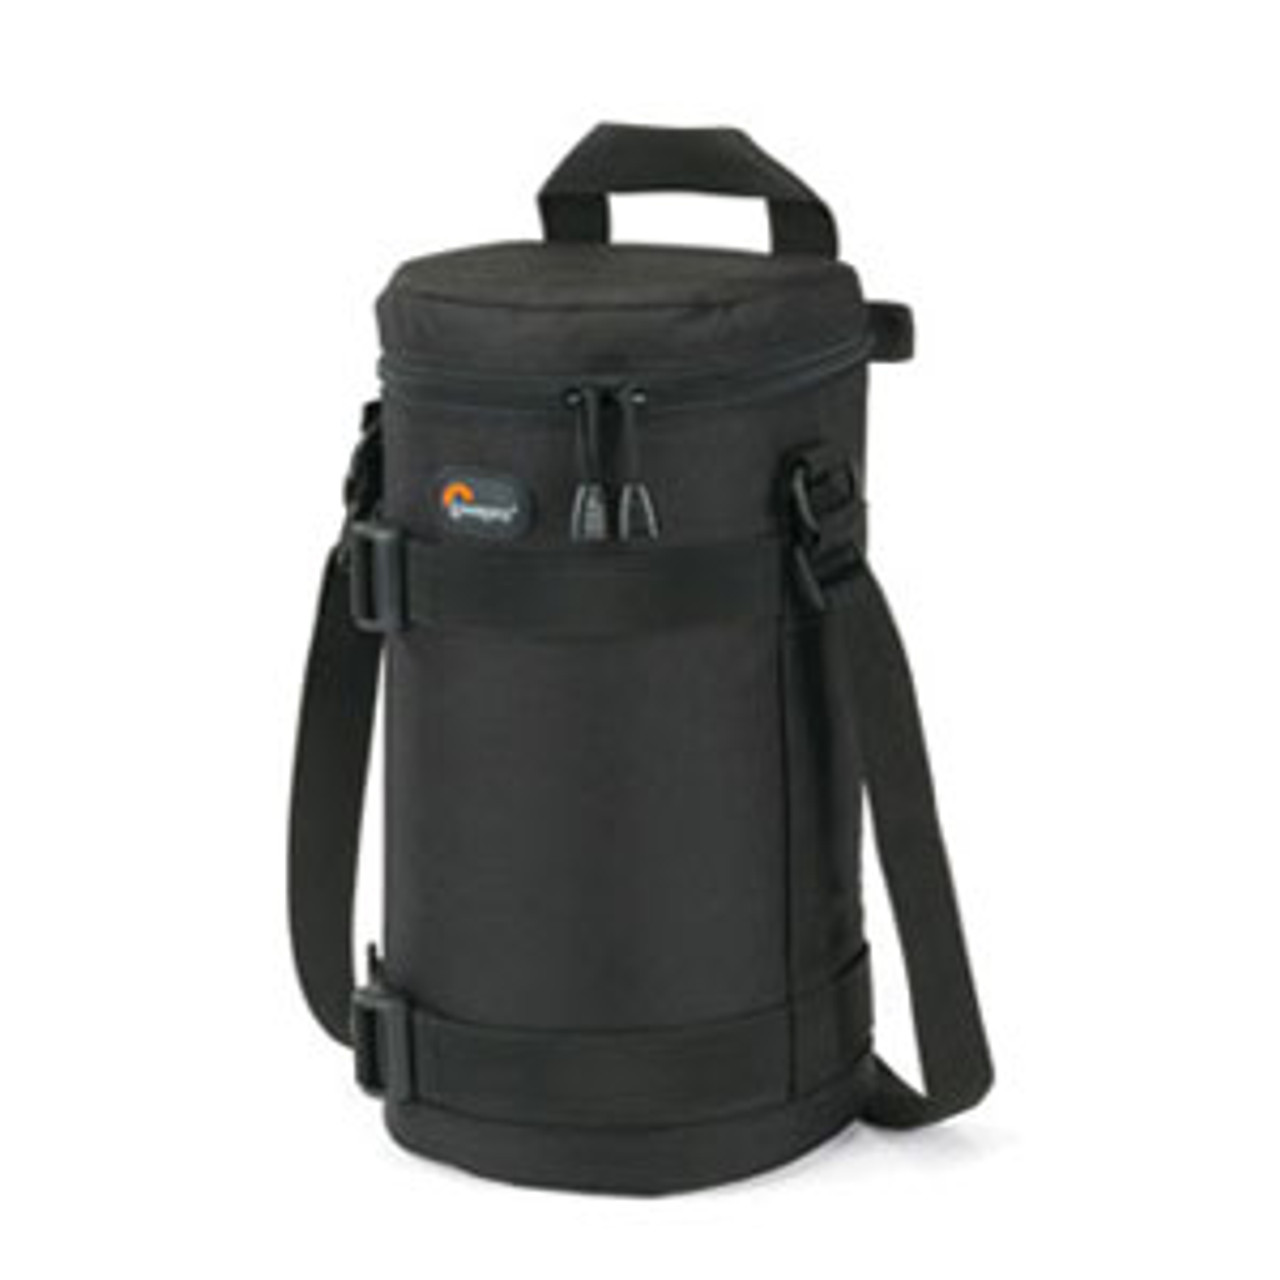 Lowepro Lens Case 11 x 26cm Black